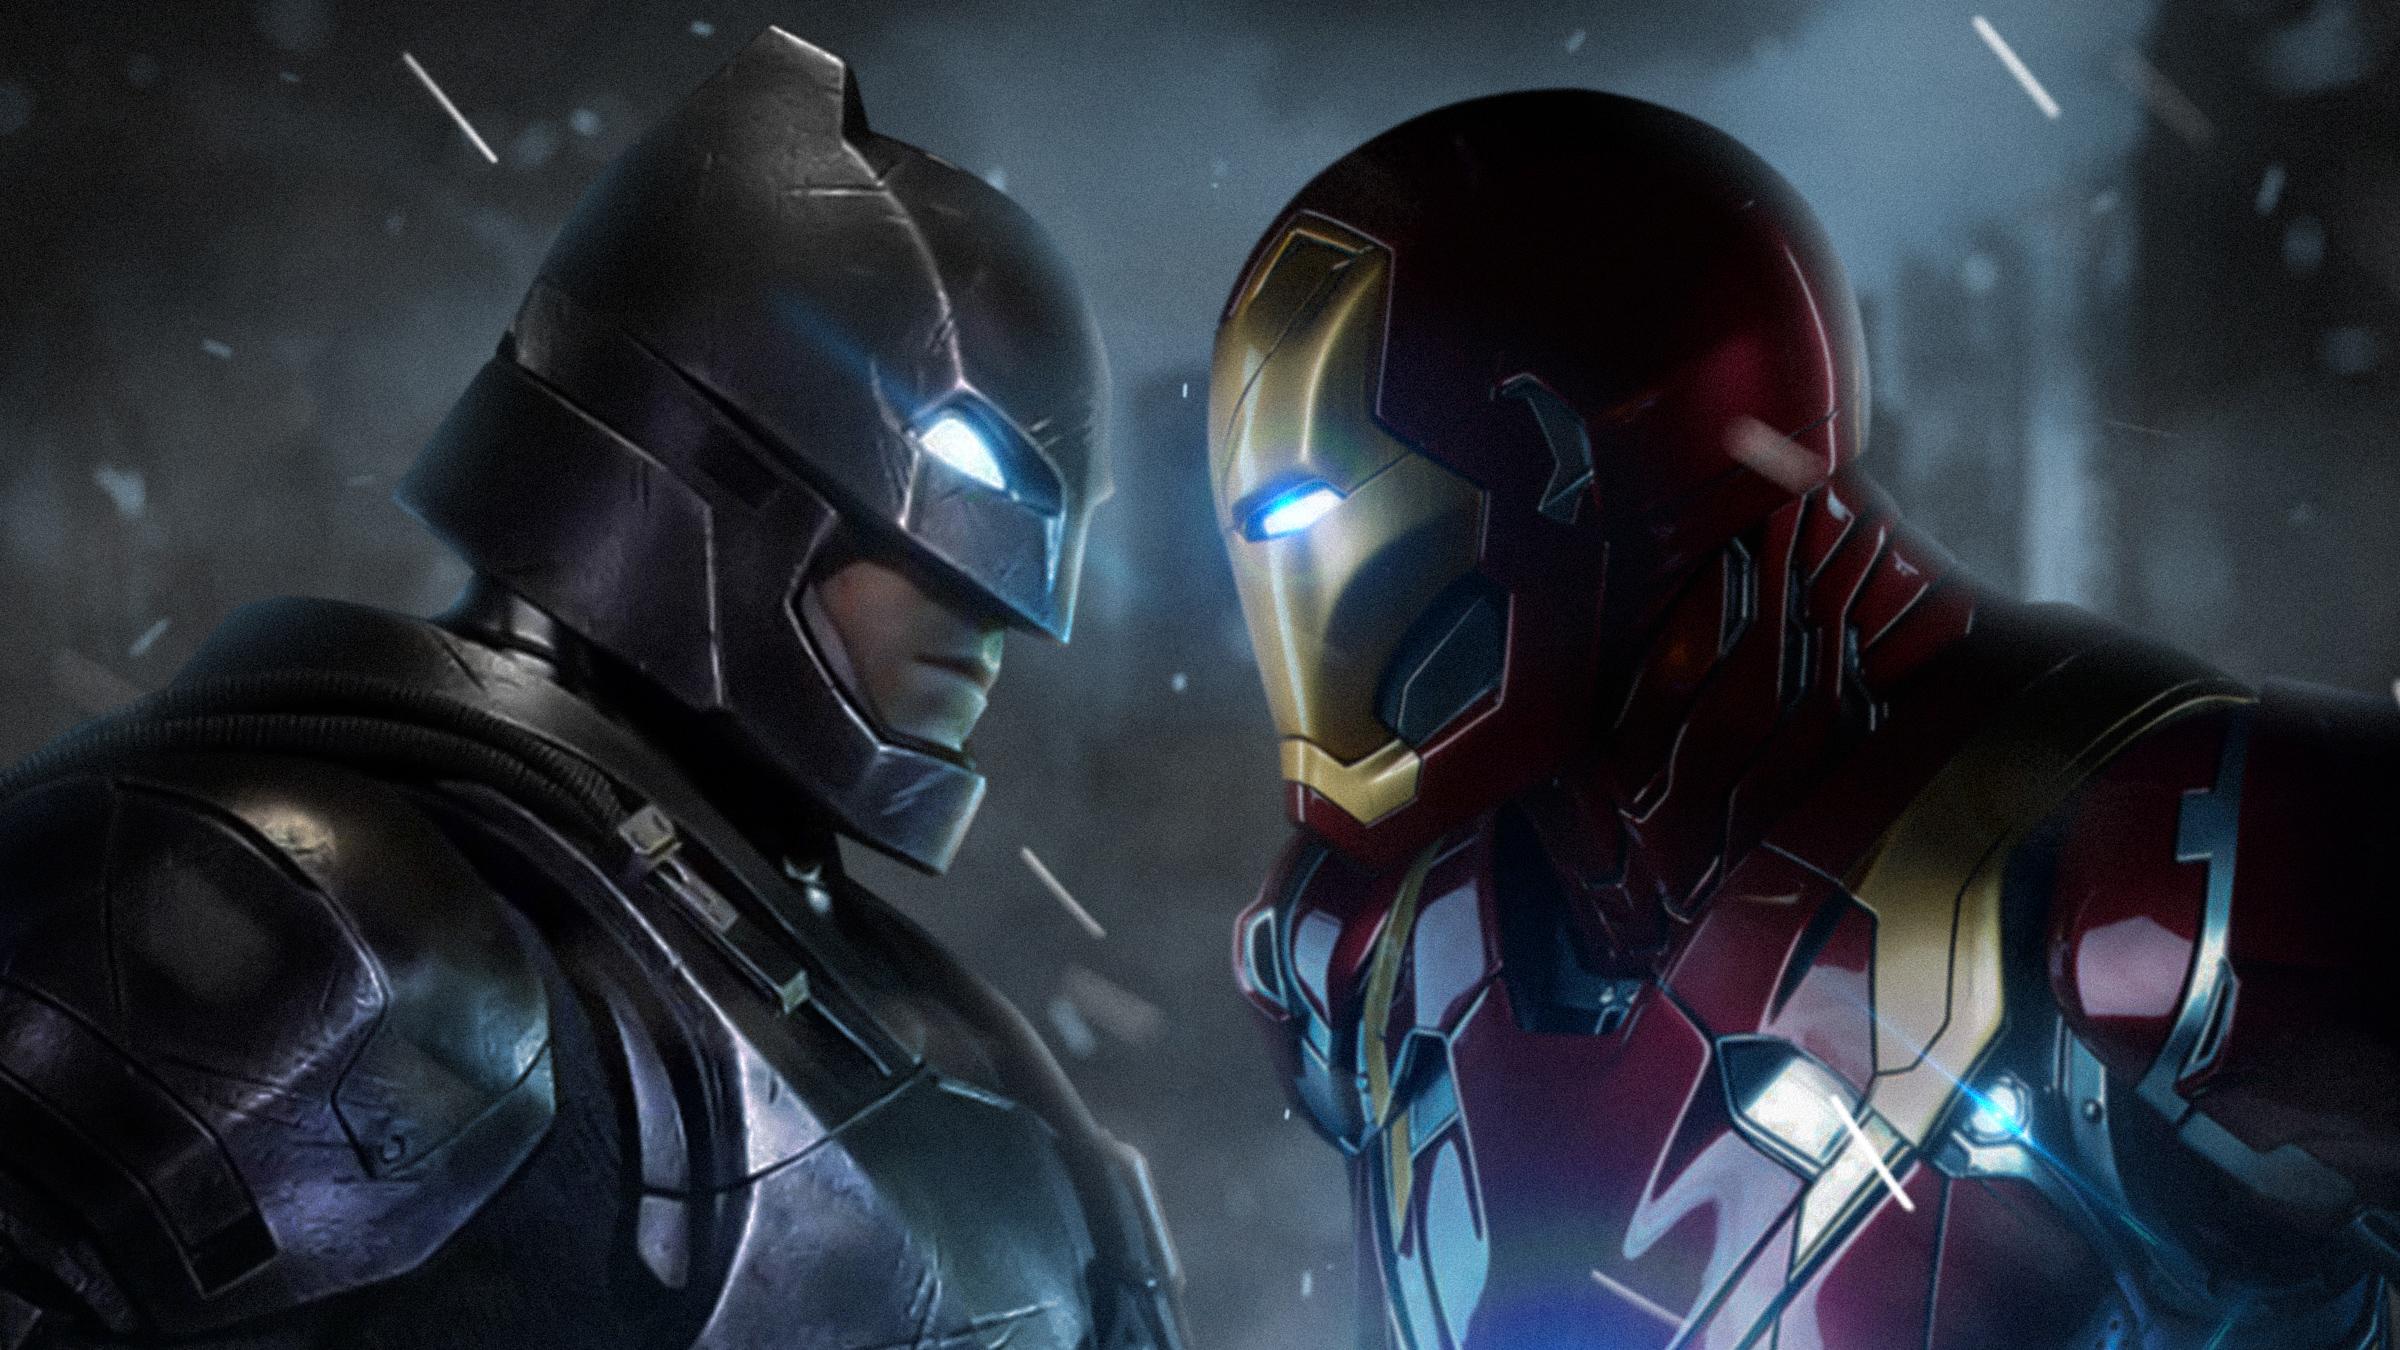 Batman Vs Iron Man, HD Superheroes, 4k Wallpapers, Images ...